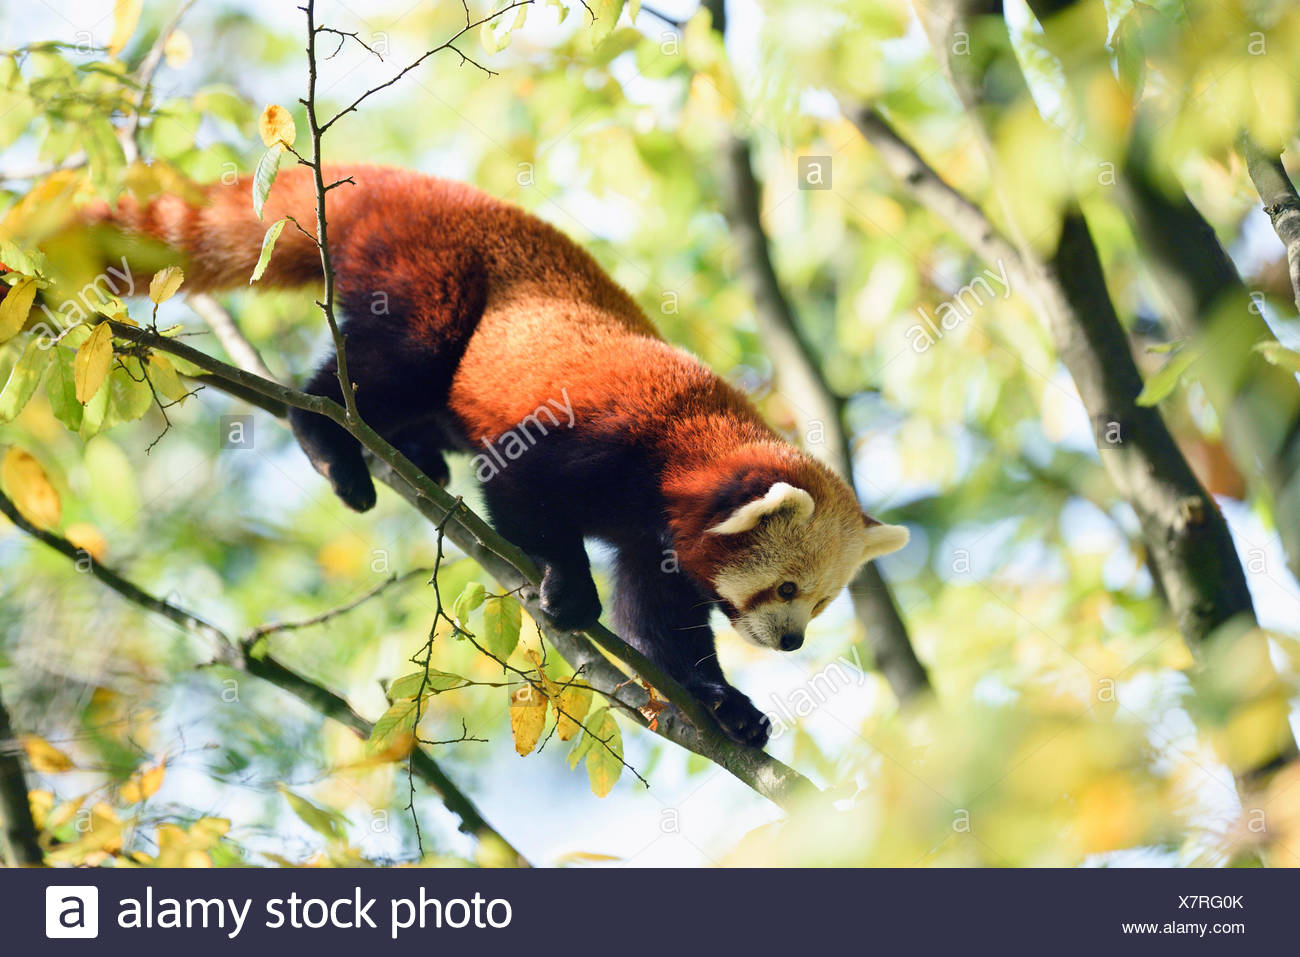 lesser panda, red panda (Ailurus fulgens), climbing on a branch Stock Photo